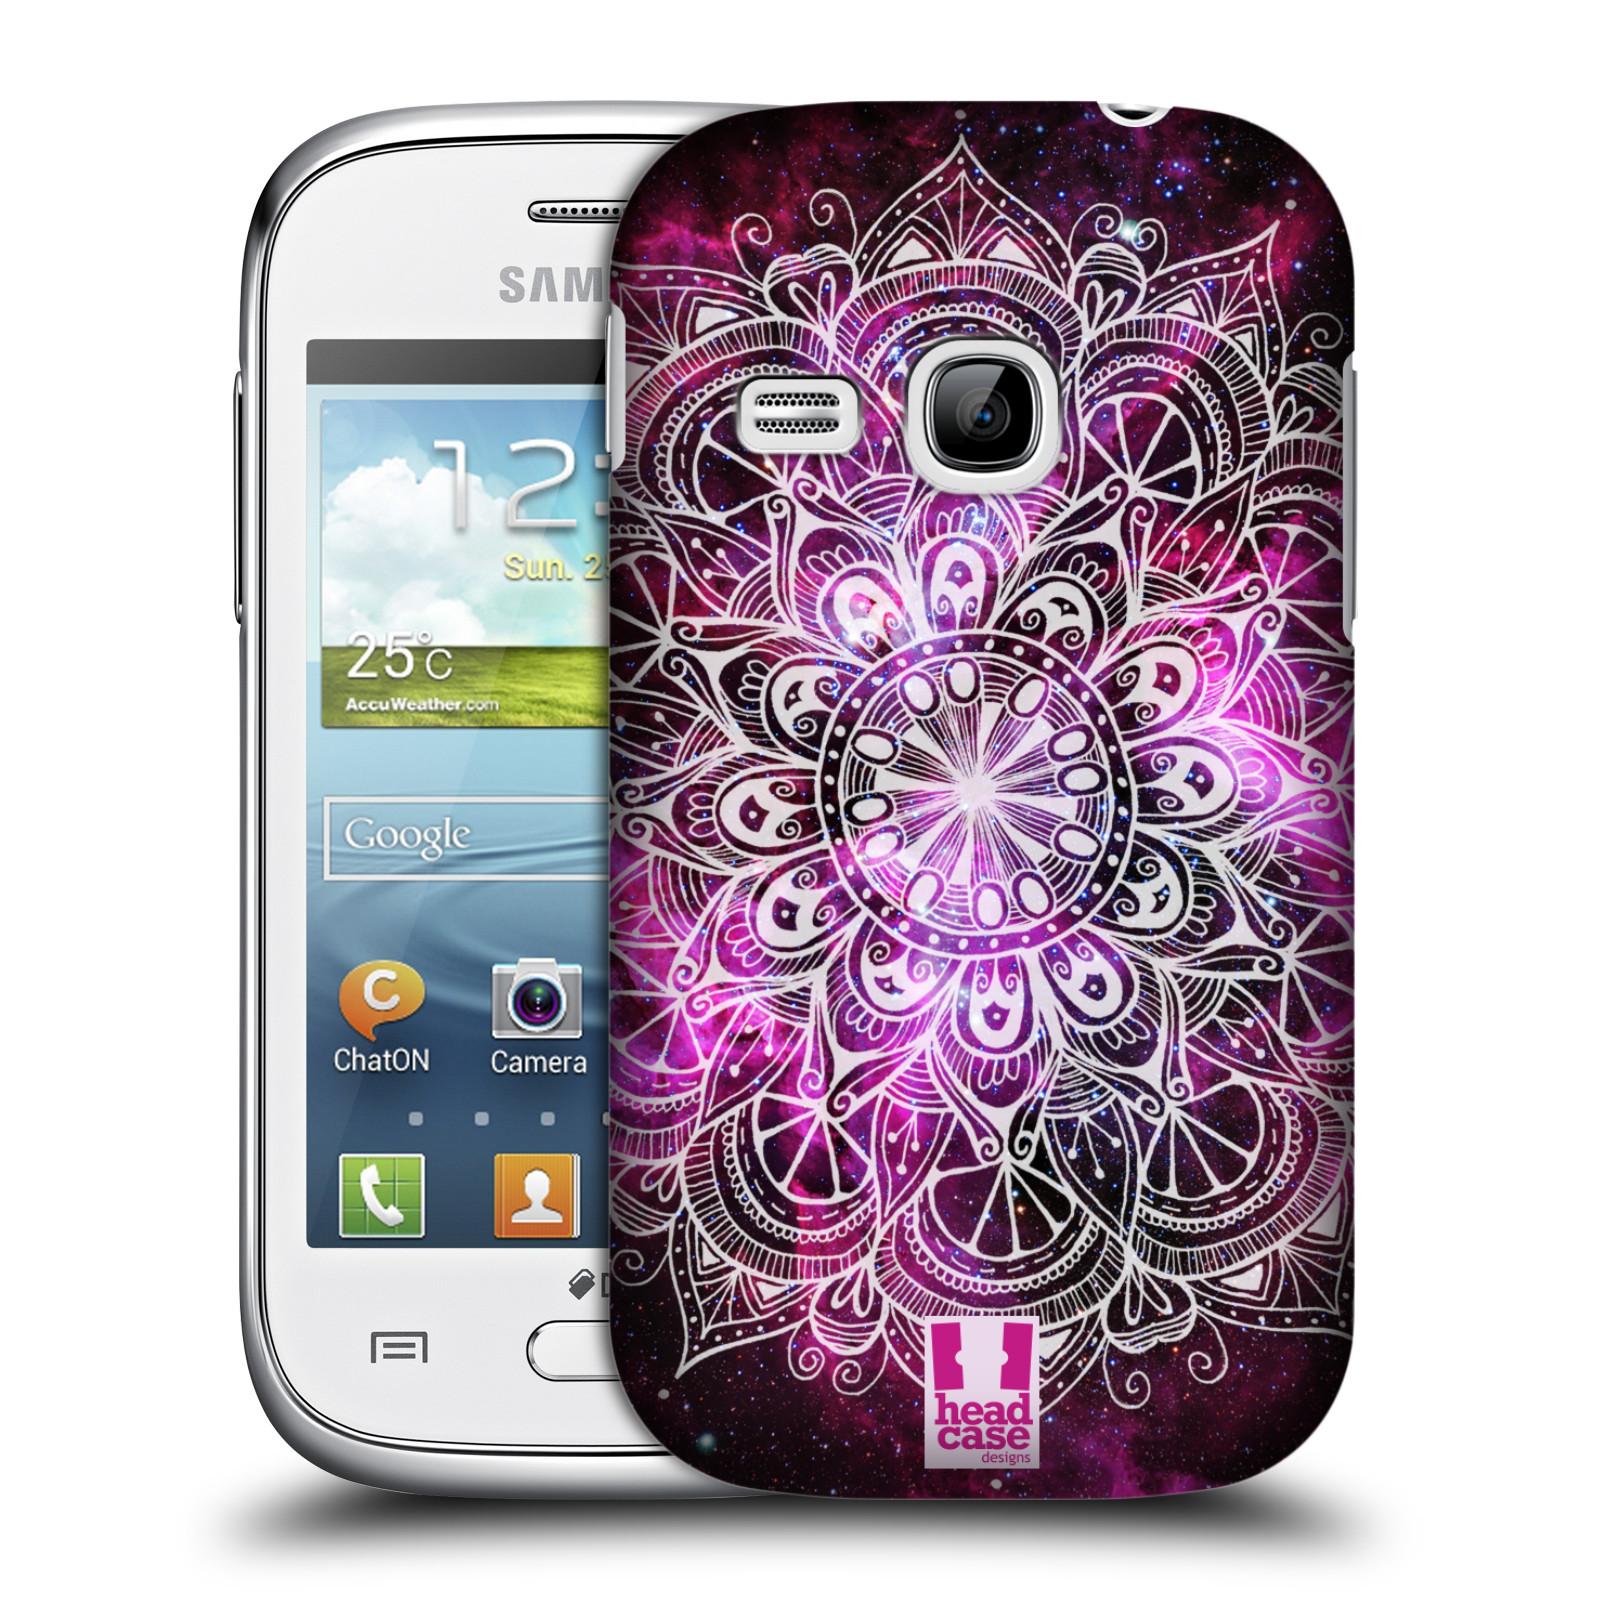 HEAD CASE plastový obal na mobil SAMSUNG Galaxy Young S6310 vzor Indie Mandala slunce barevná FIALOVÁ MLHOVINA